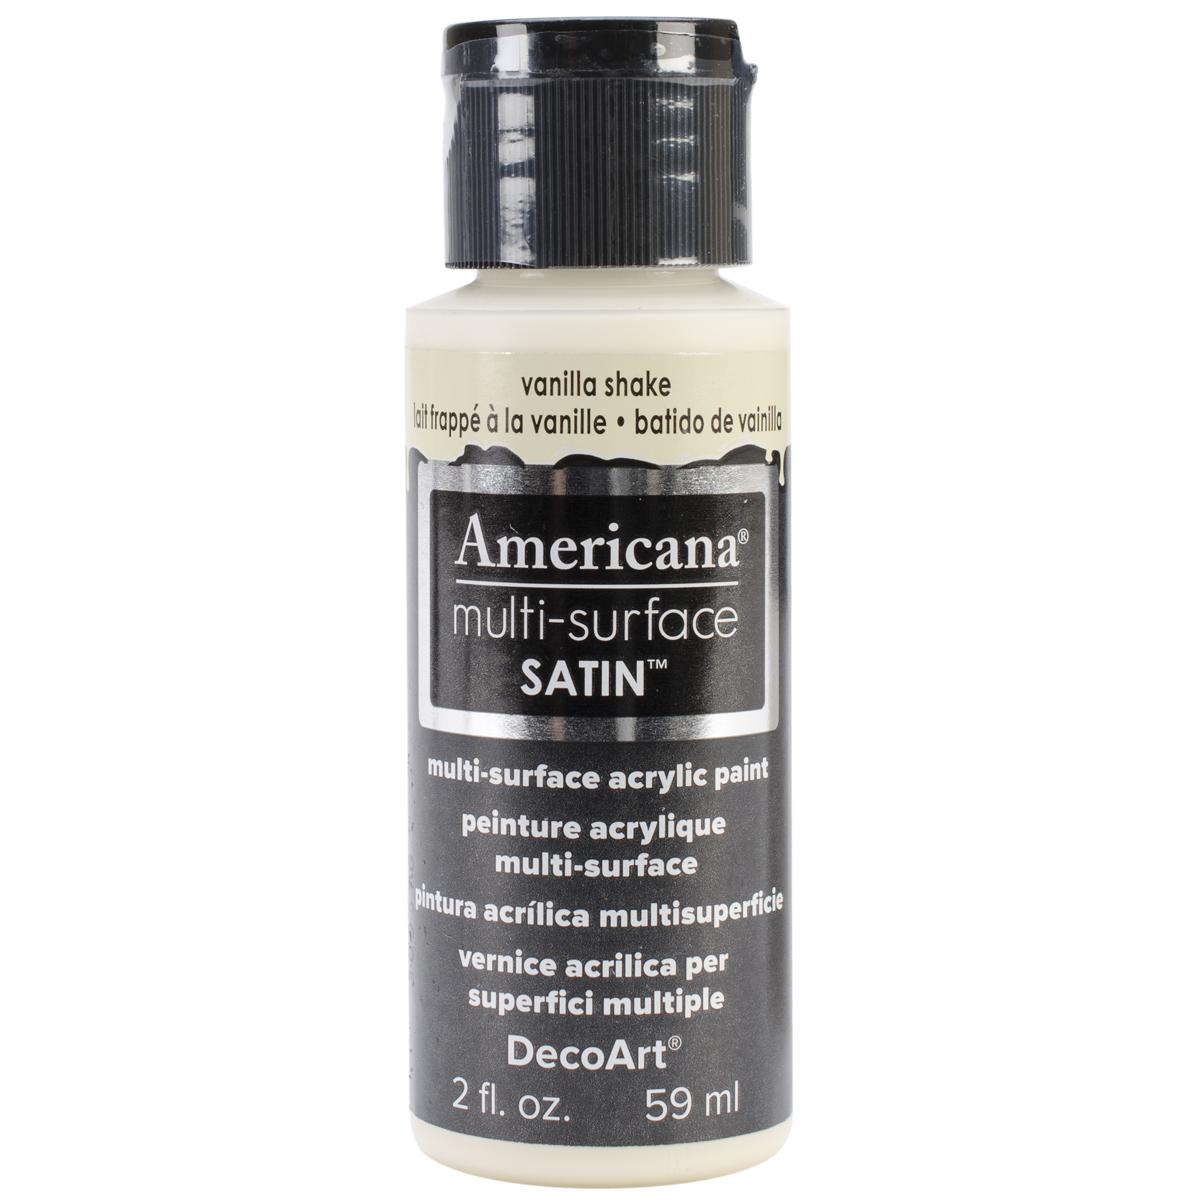 Americana Multi-Surface Satin Acrylic Paint 2oz-Vanilla Shake - image 1 of 1